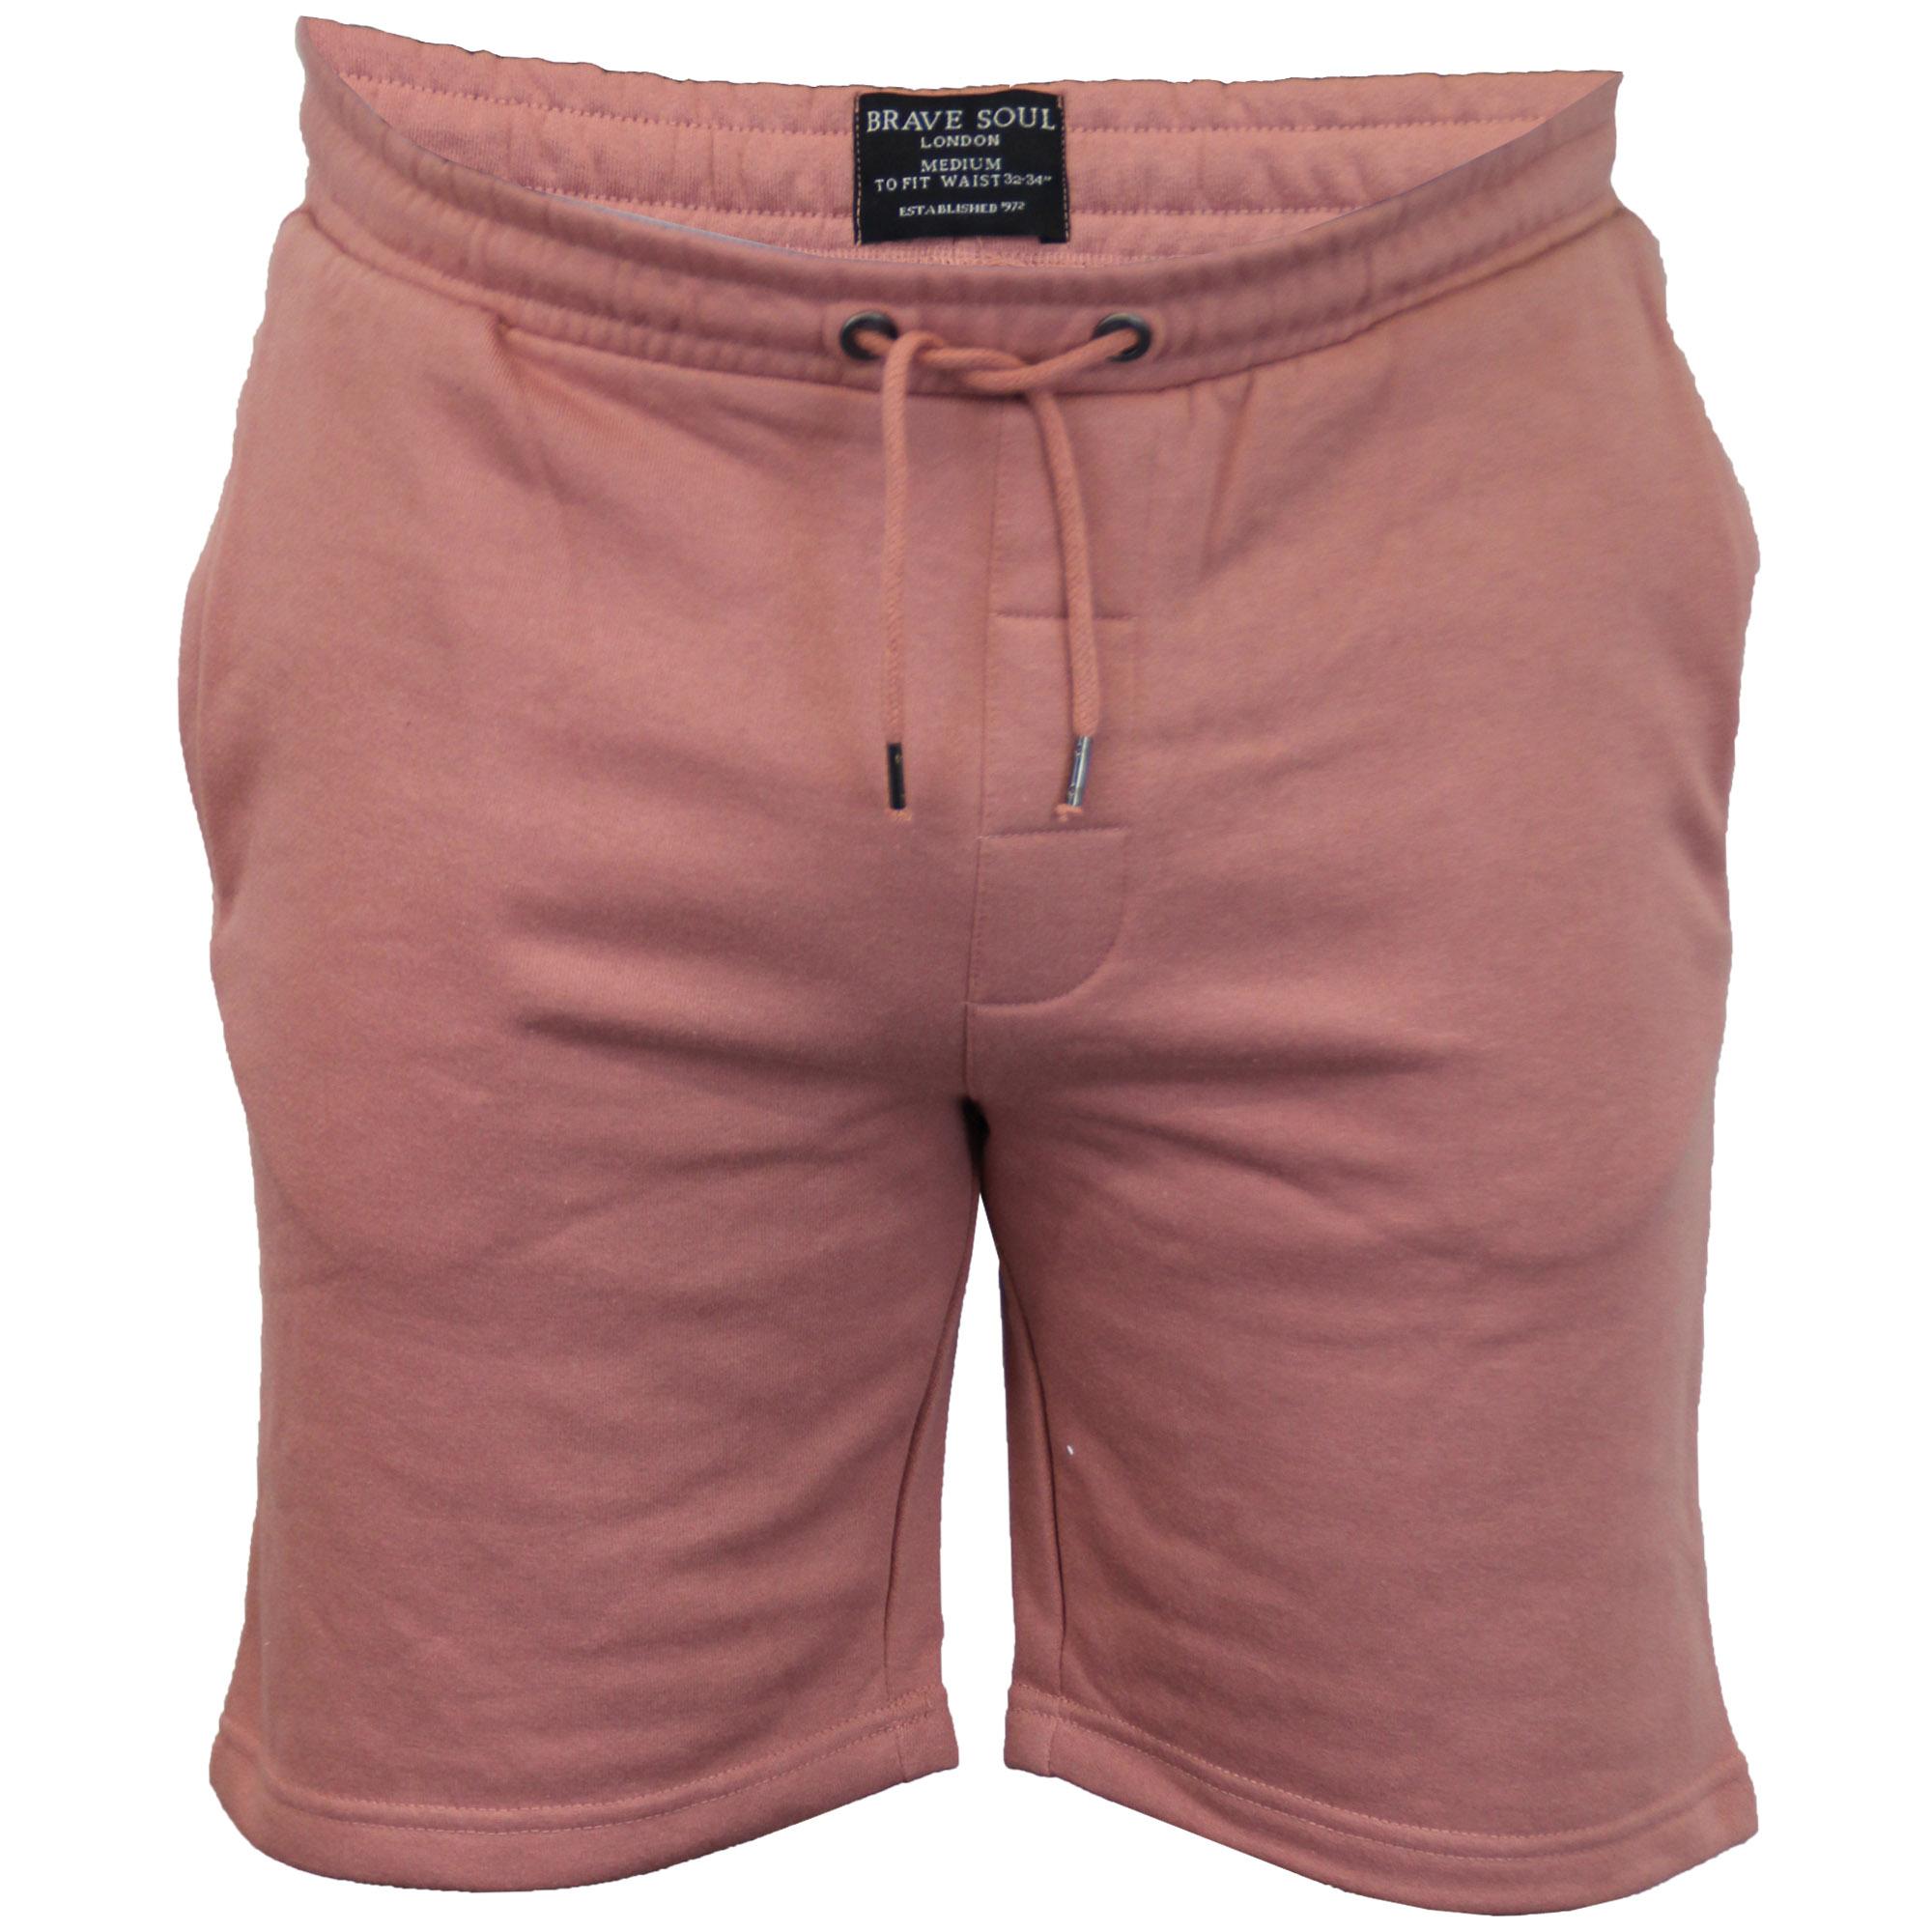 Mens-Jogger-Shorts-Tarley-by-Brave-Soul-Knee-Length-Casual-Fleece-Lined-Summer thumbnail 45